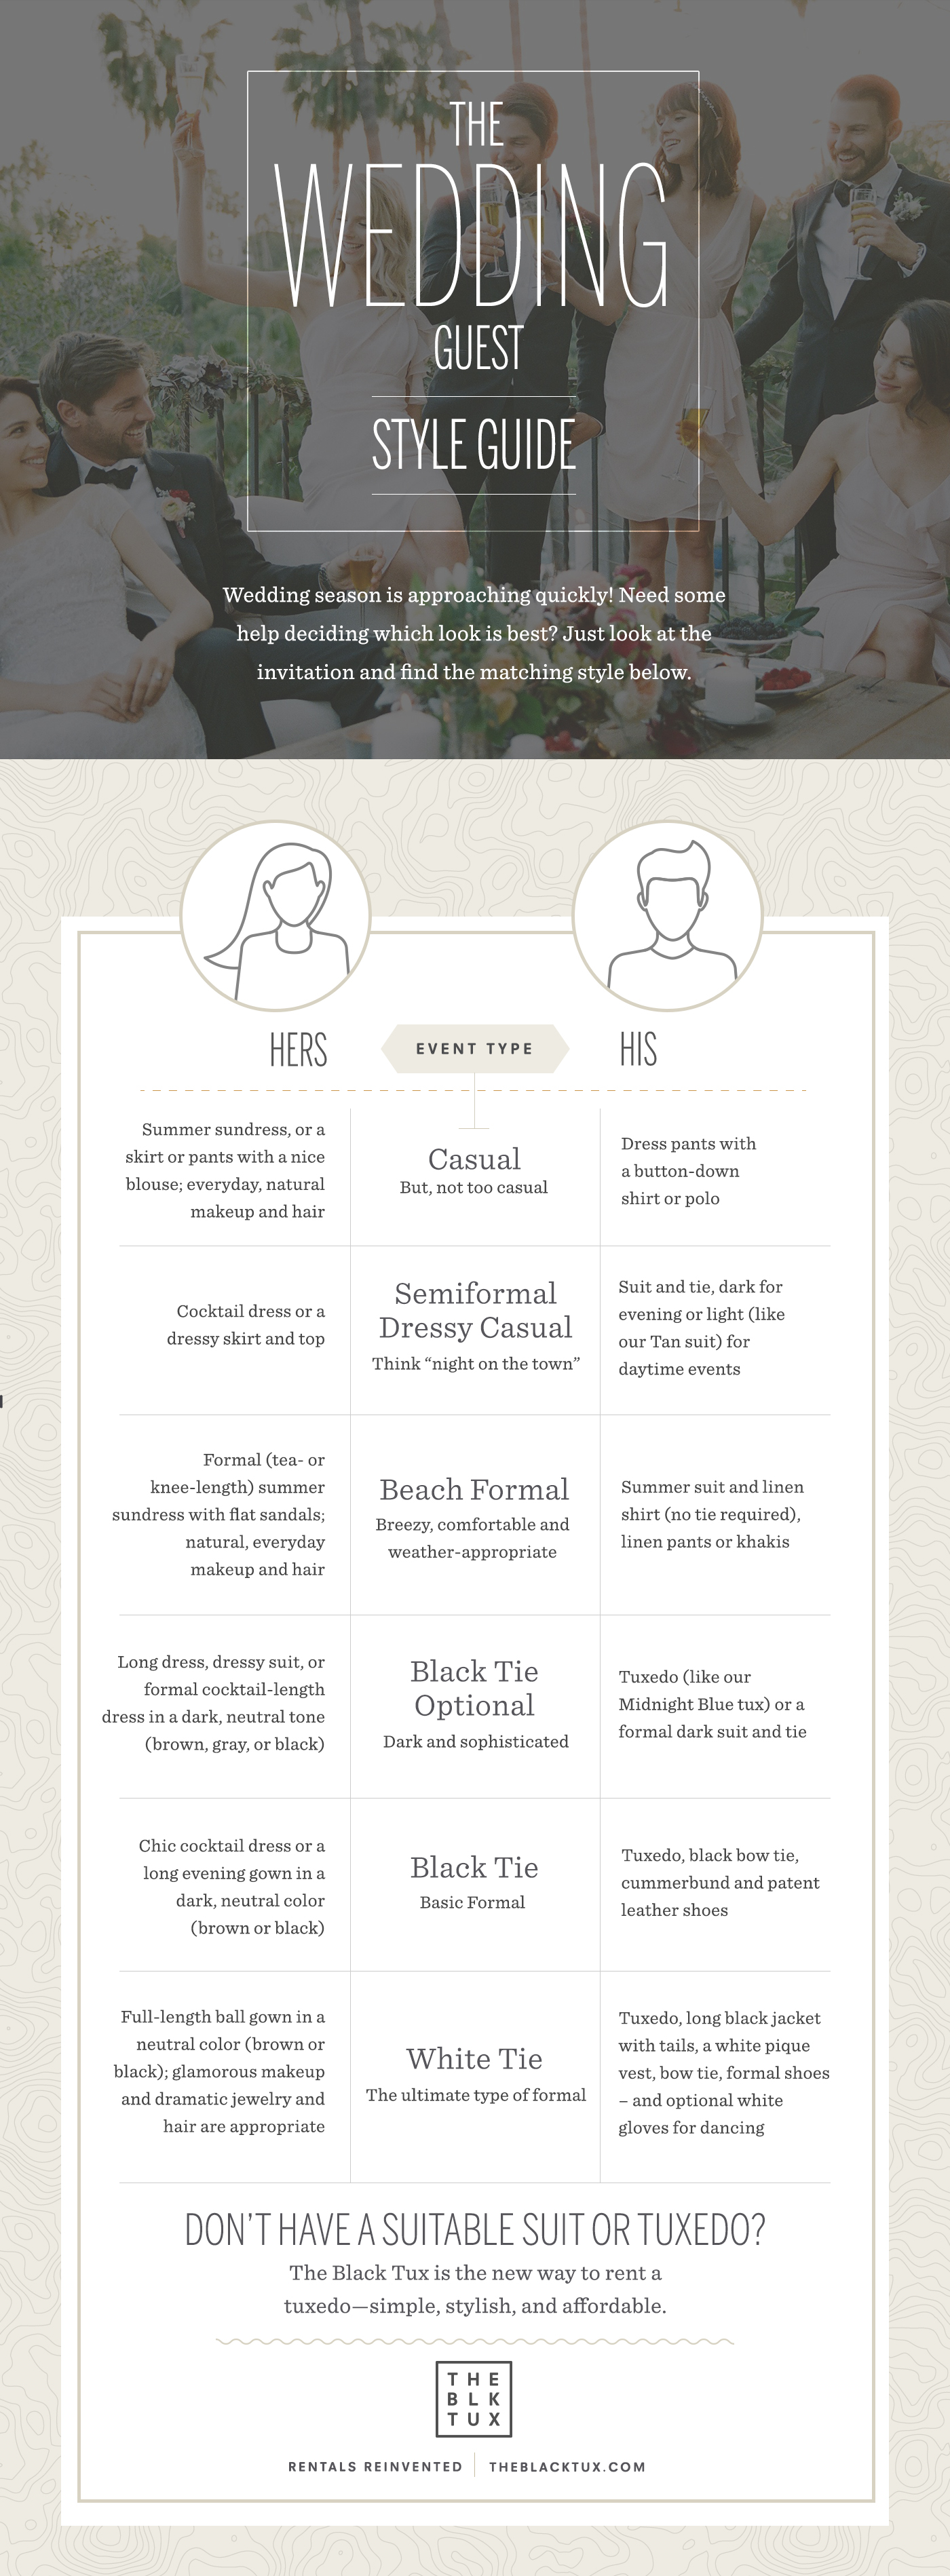 Bridalbliss.com | The Black Tux